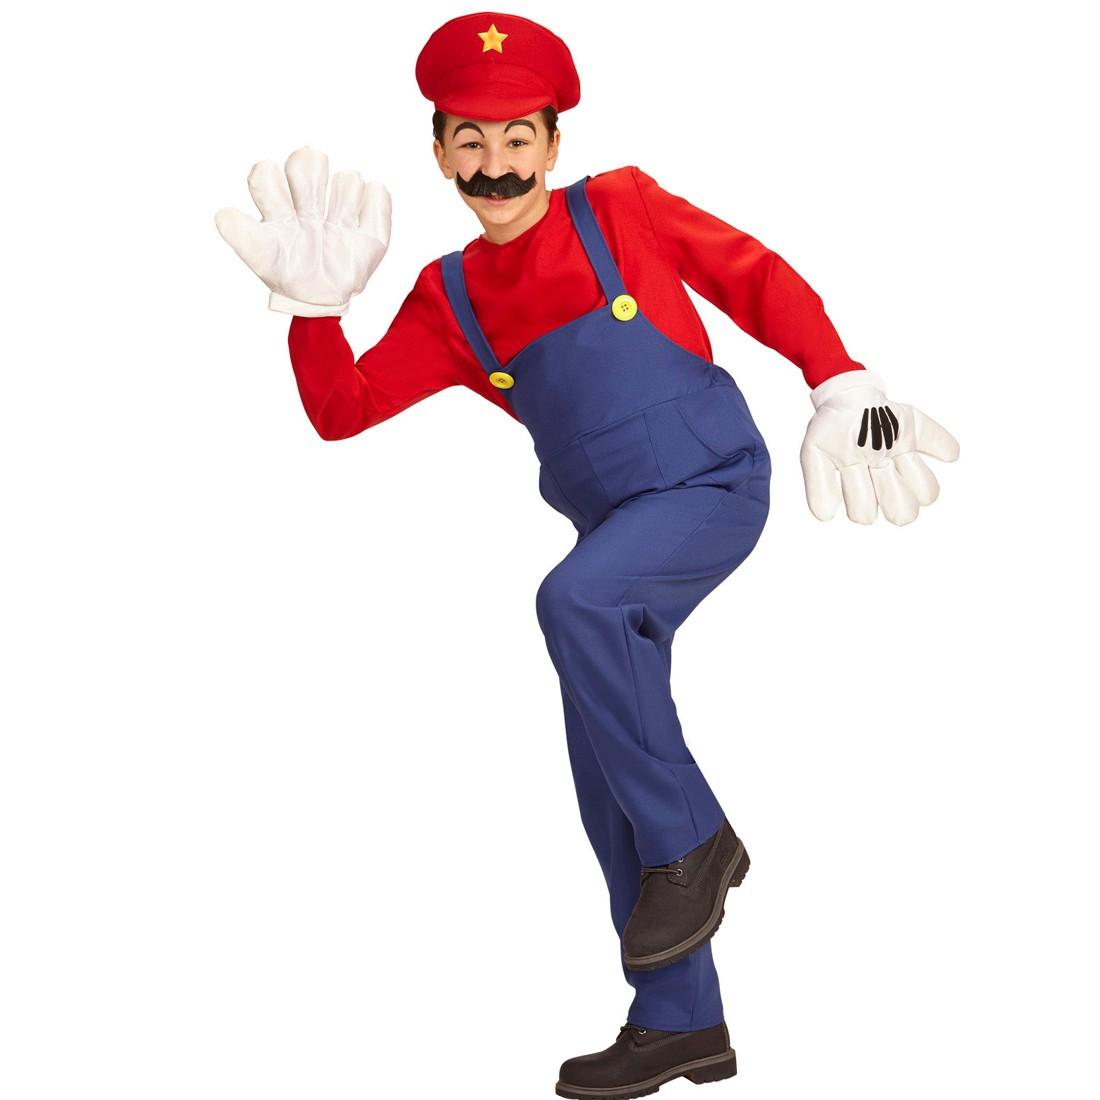 Kinder Super Mario Kostüm Faschingskostüm Klempner, 19,99